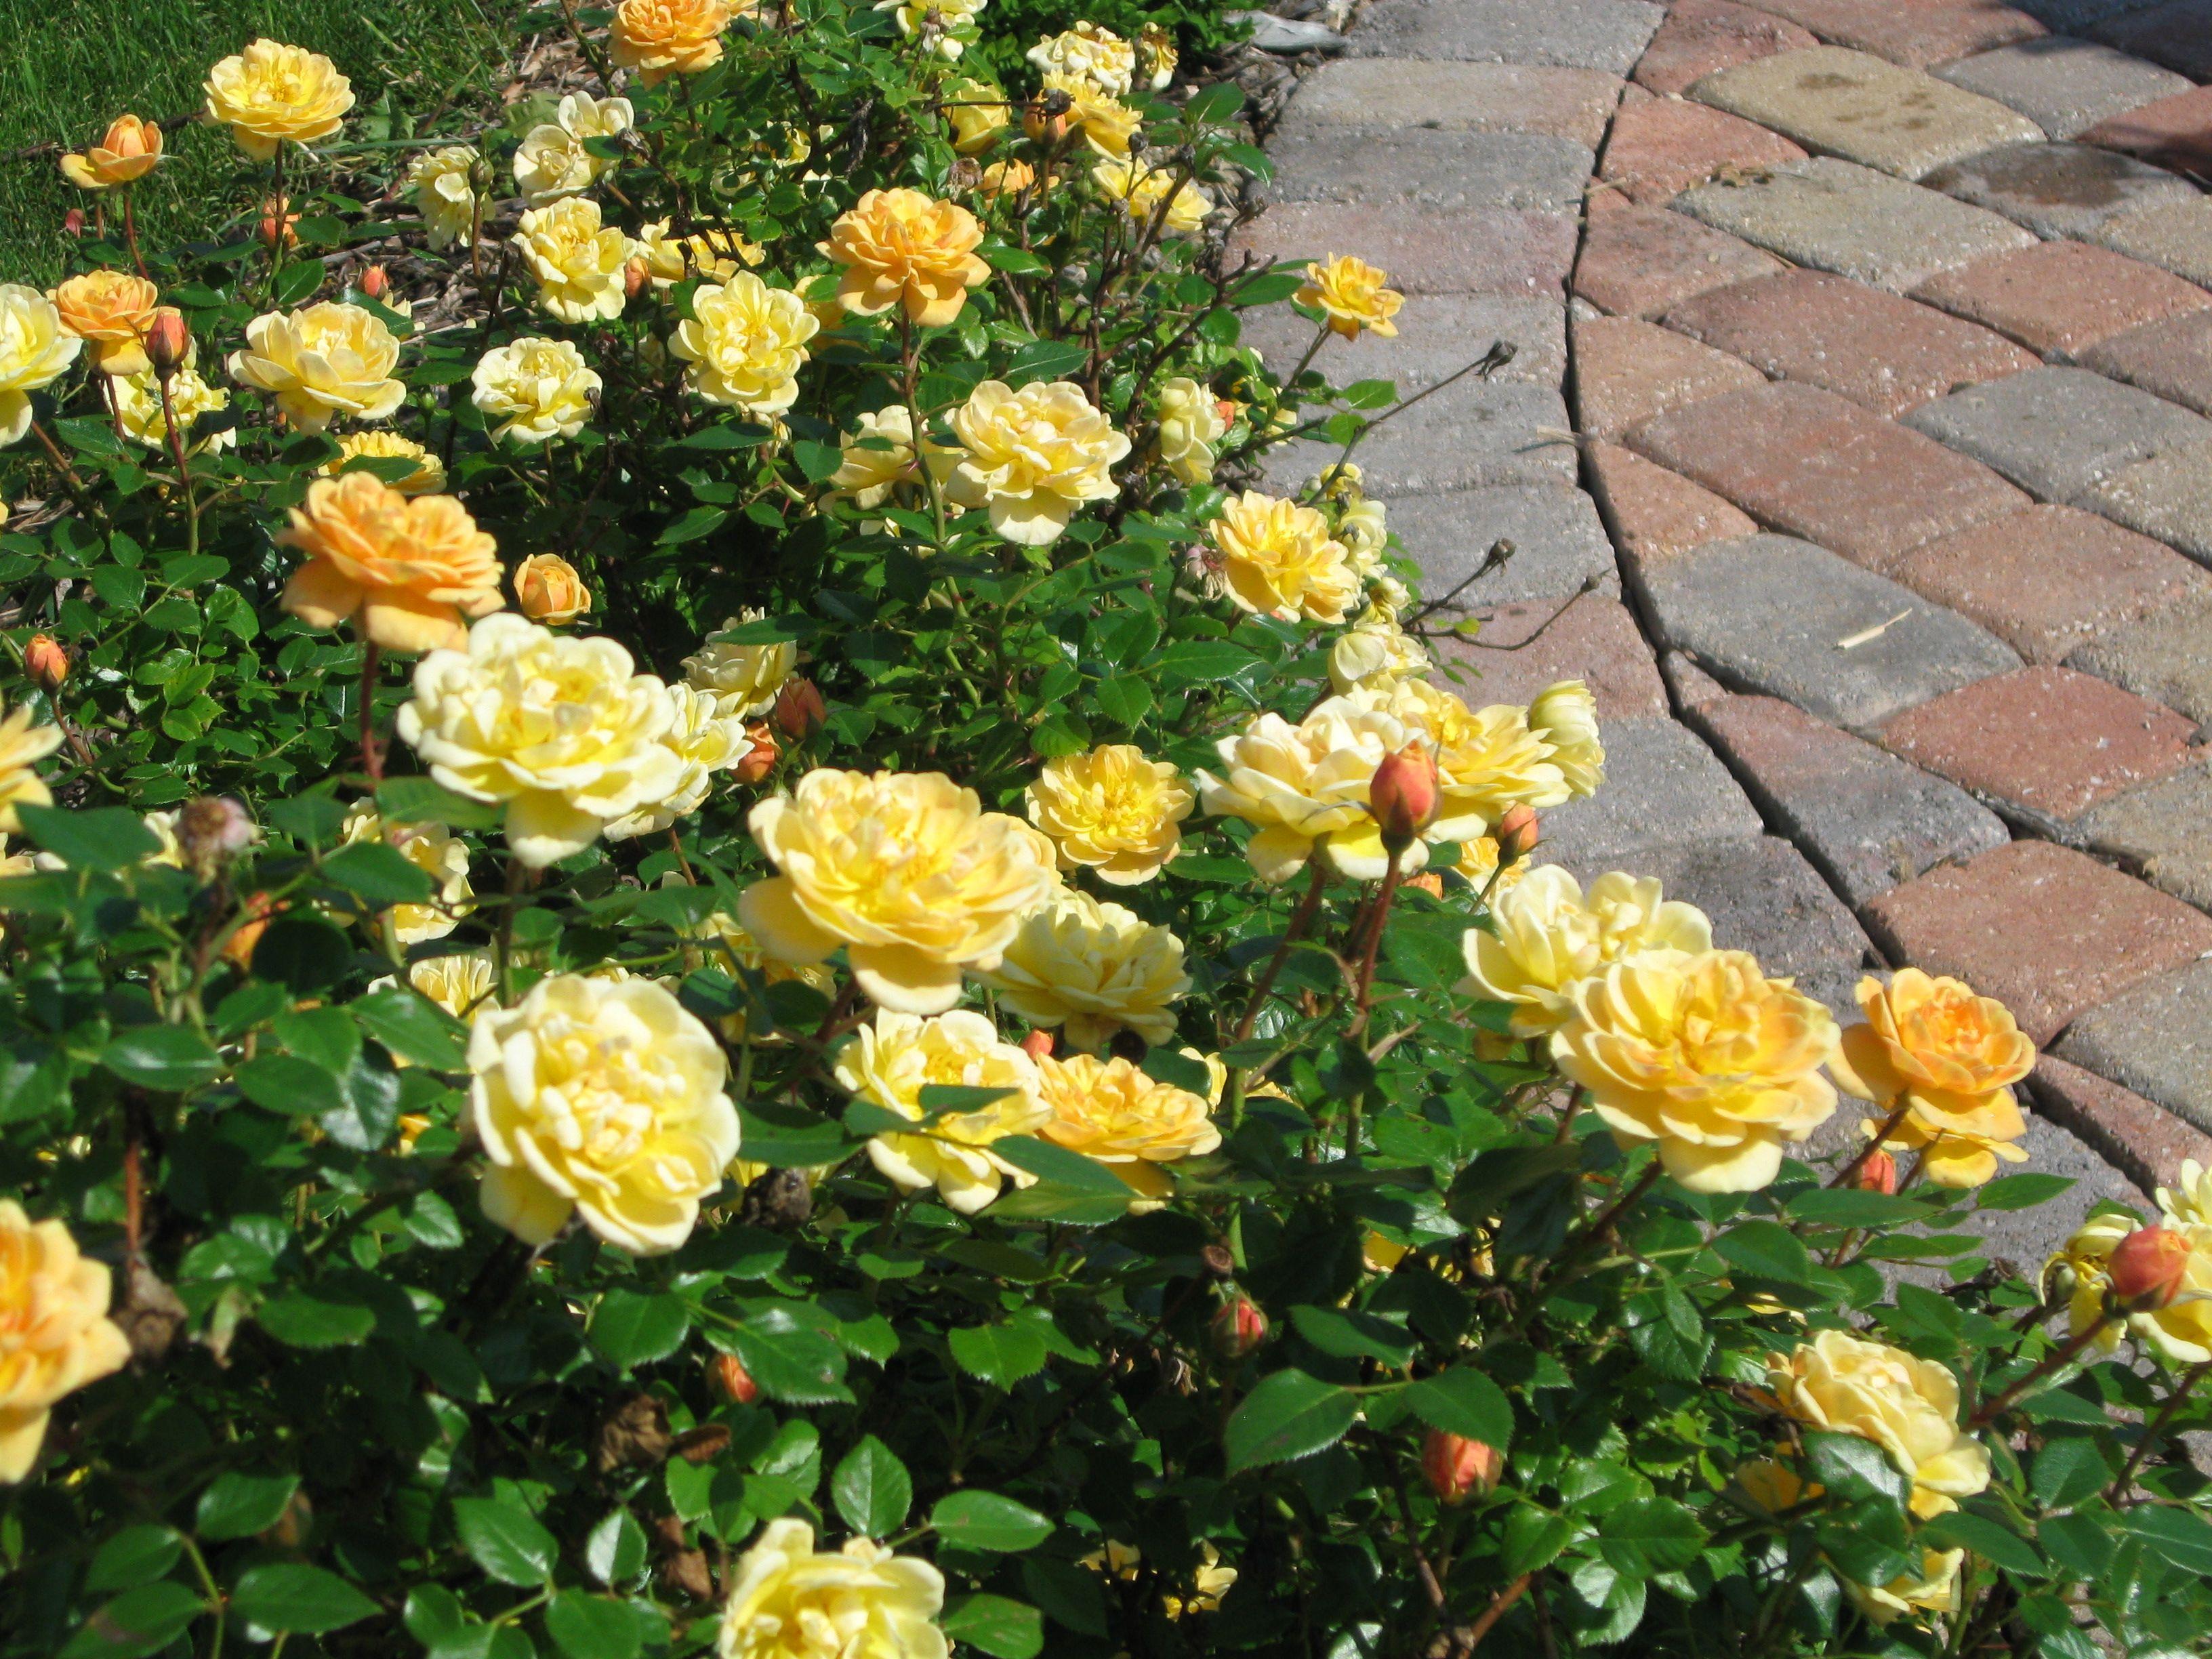 Sunrosa Yellow Shrub Rose Monrovia Sunrosa Yellow Shrub Rose Shrub Roses Yellow Shrubs Dwarf Shrubs